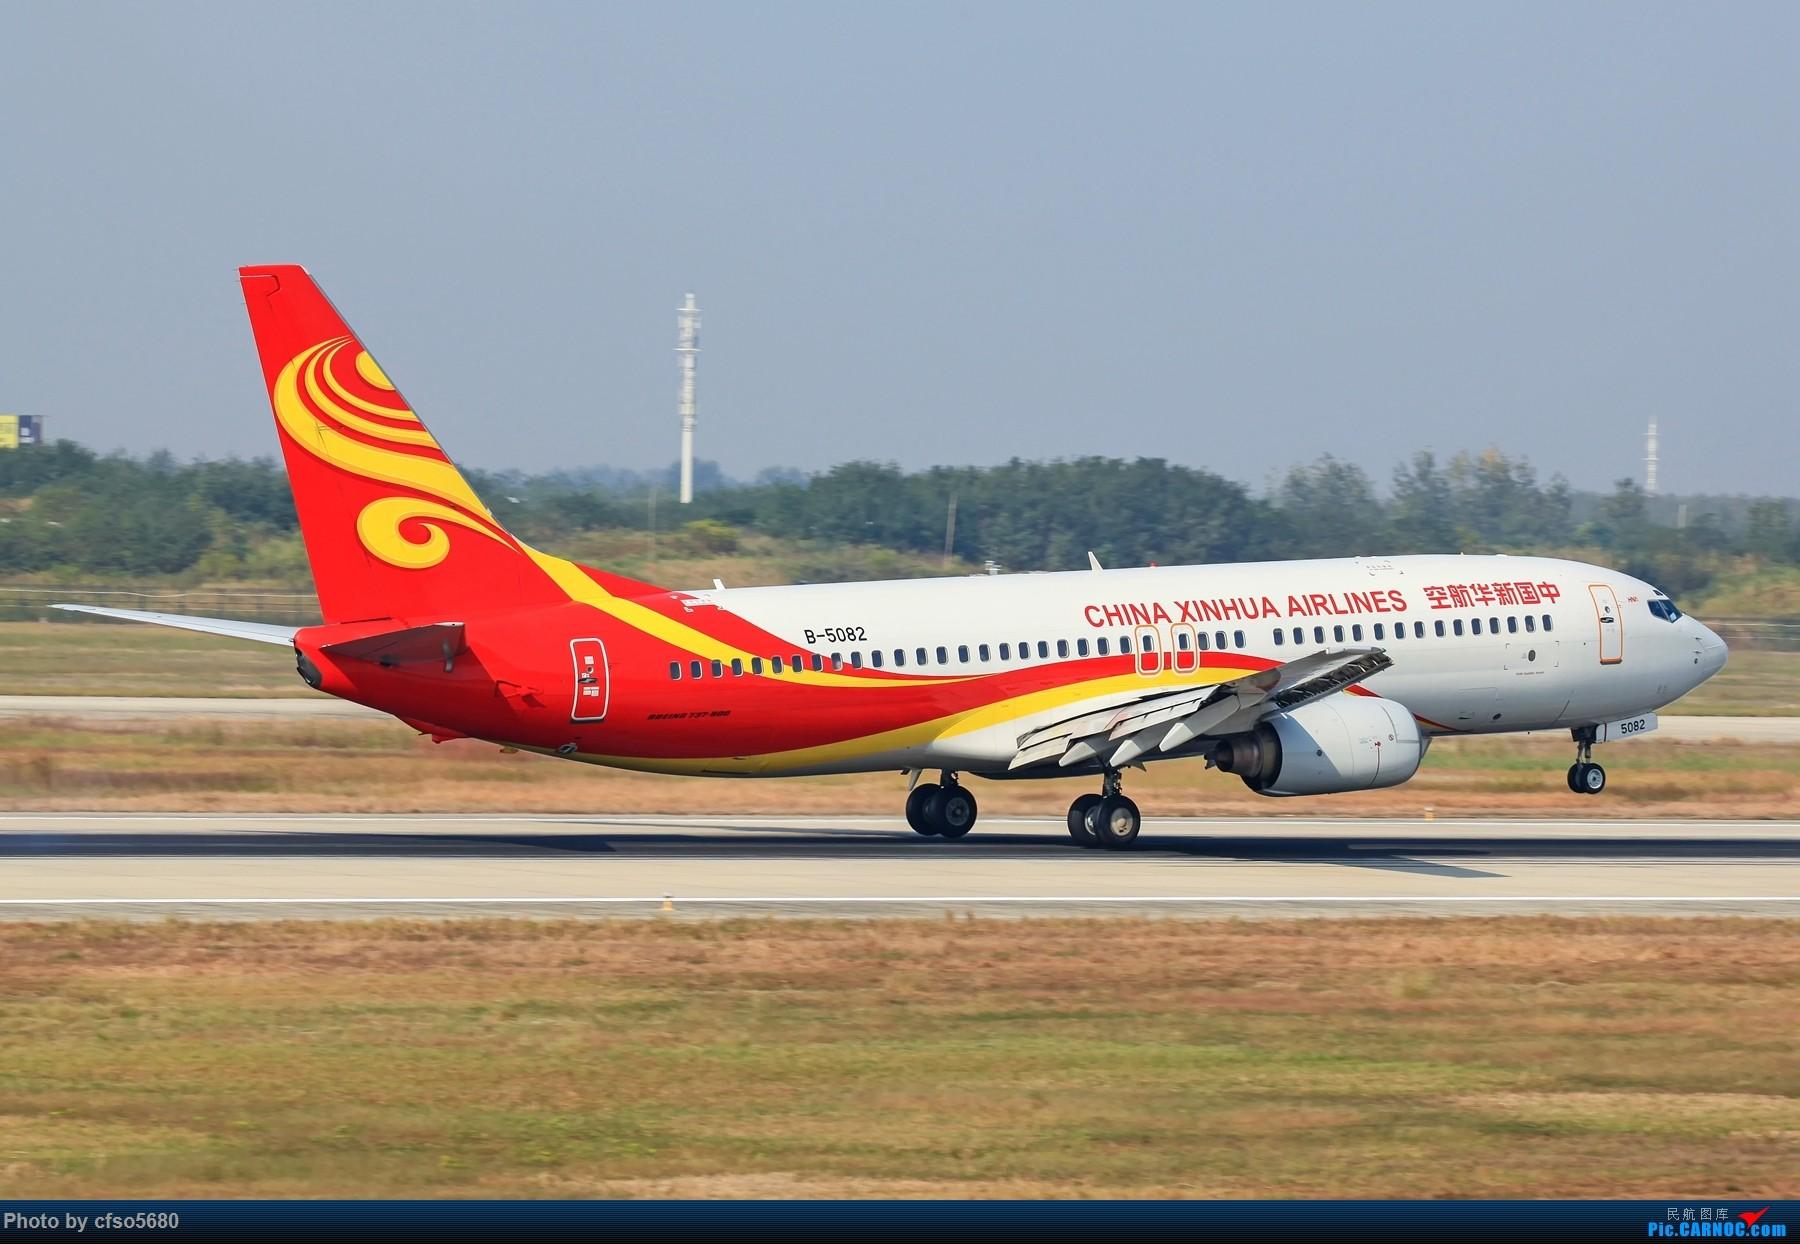 Re:[原创]国庆假期合肥新桥机场拍机活动 BOEING 737-800 B-5082 中国合肥新桥国际机场